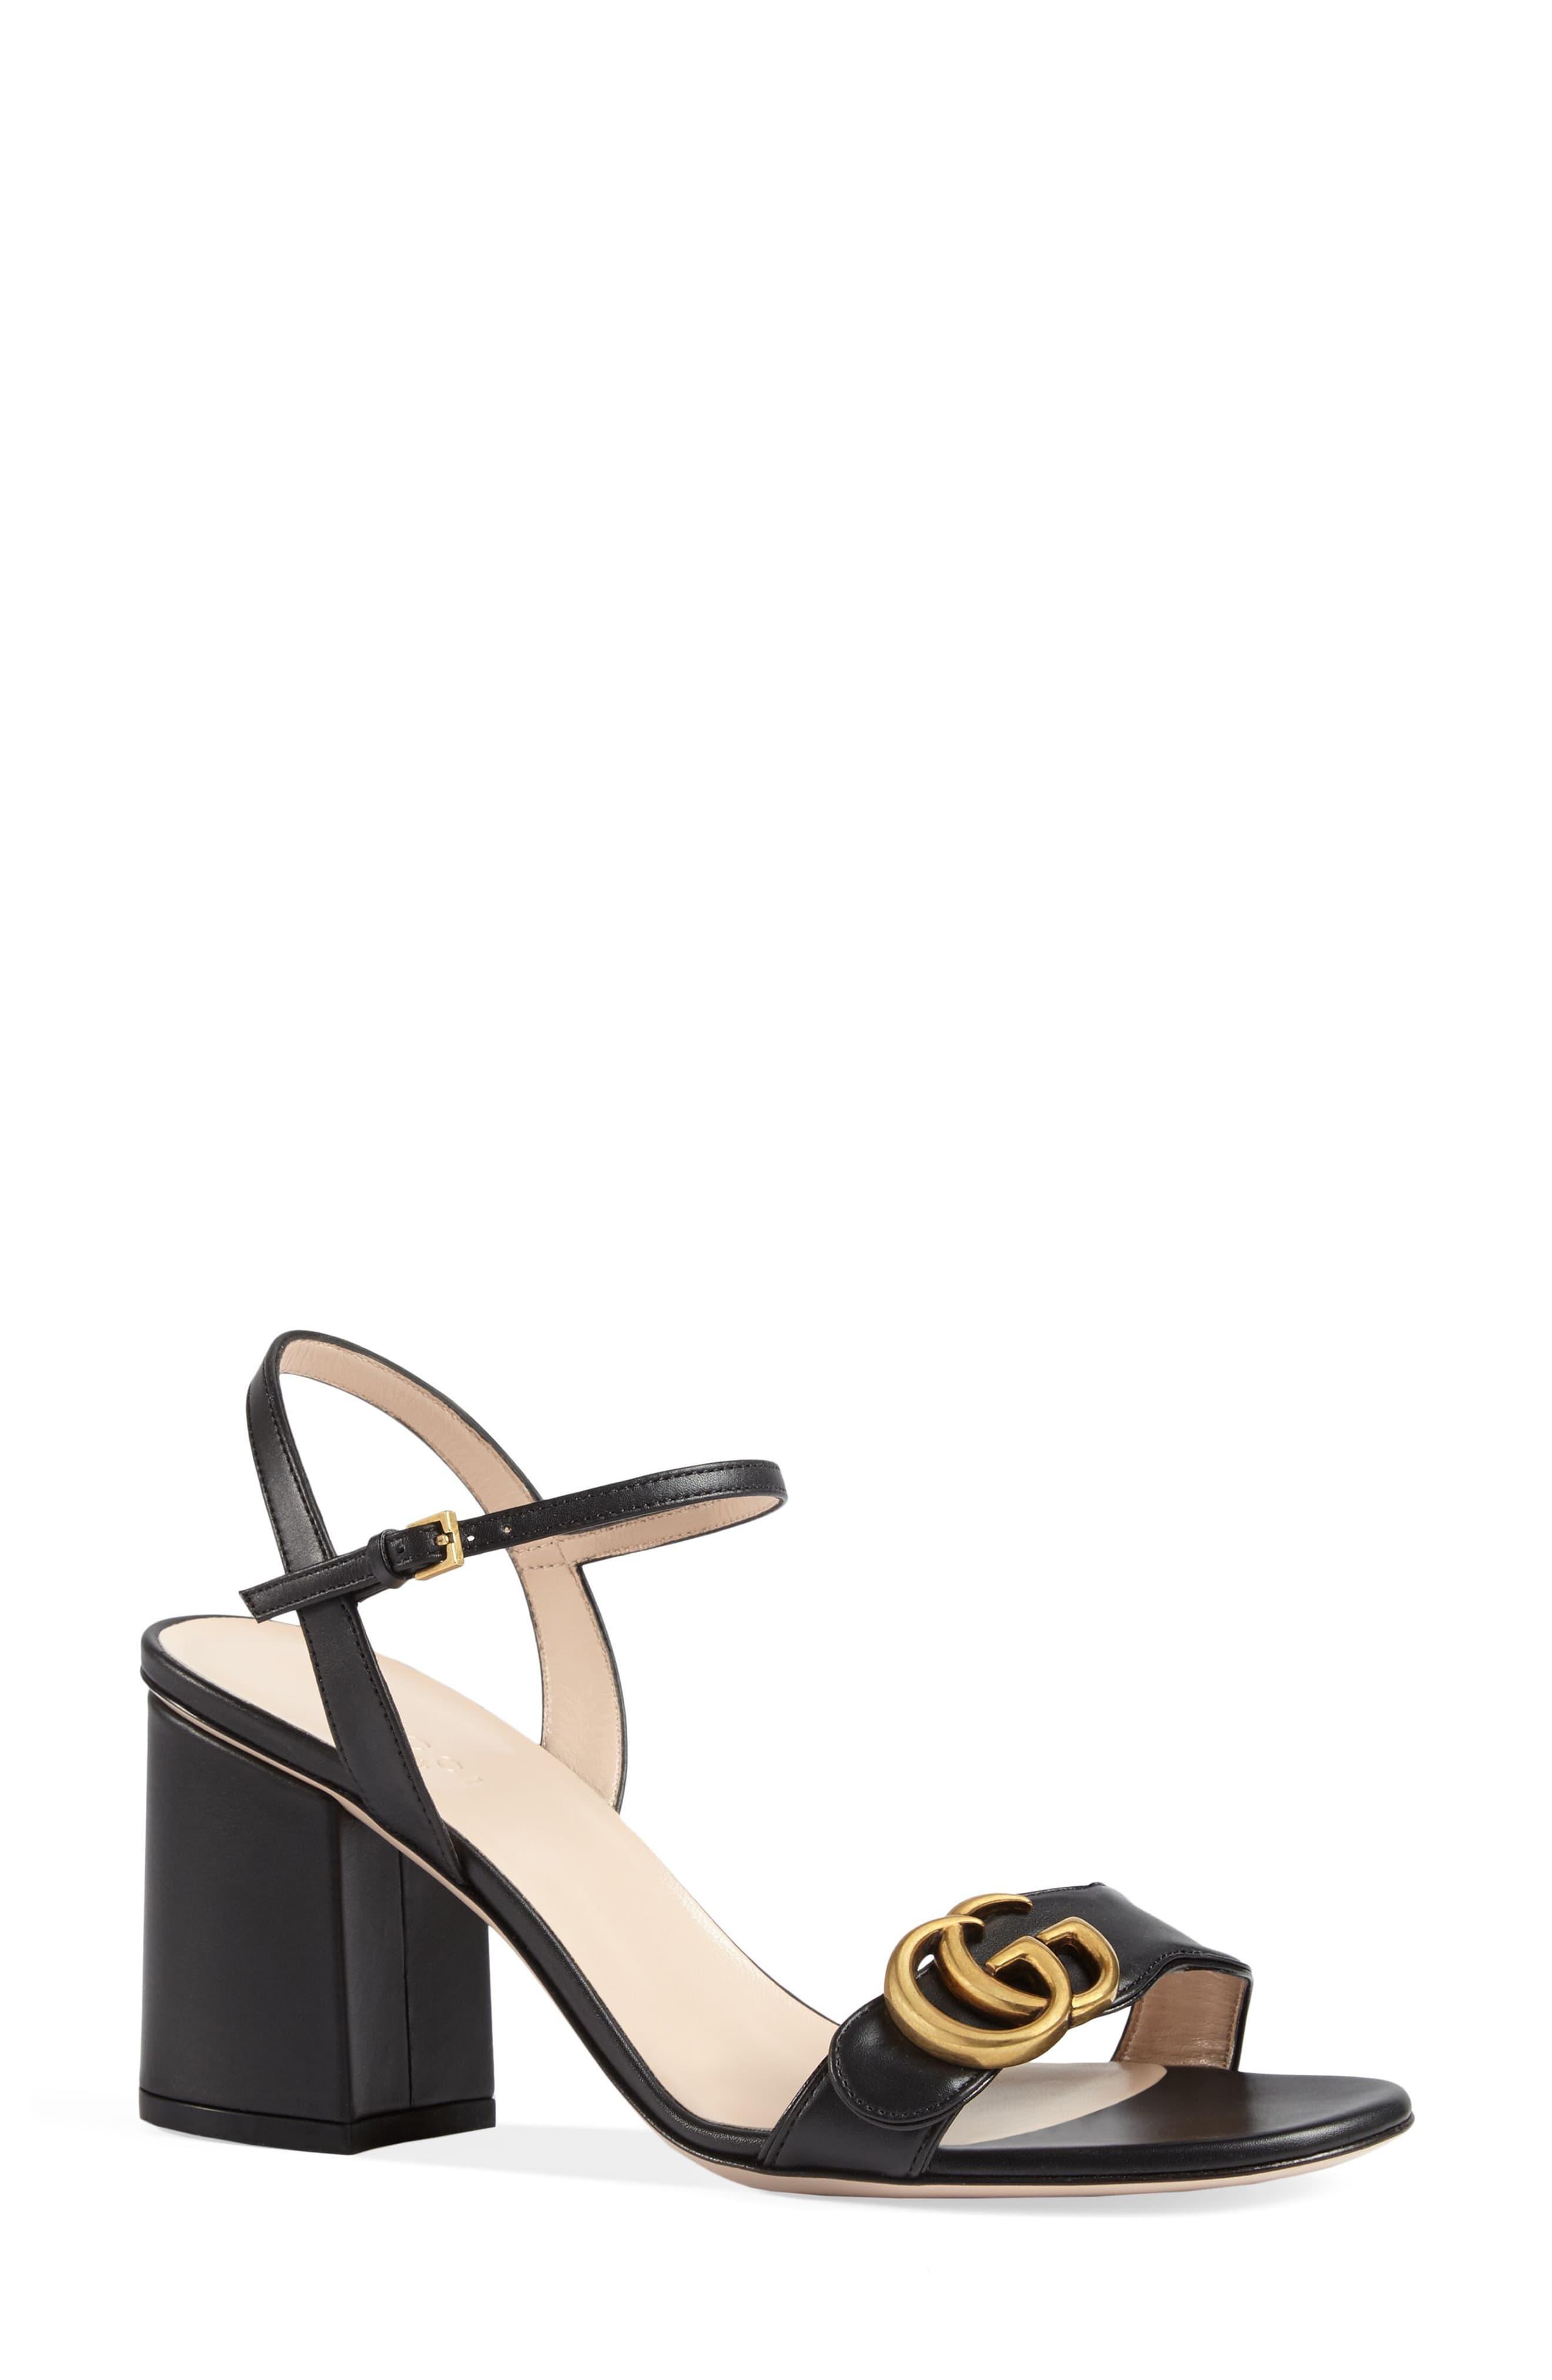 4ea3898e3 ... Gucci Black Gg Marmont Block Heel Sandals · Visit Nordstrom. Tap to  visit site